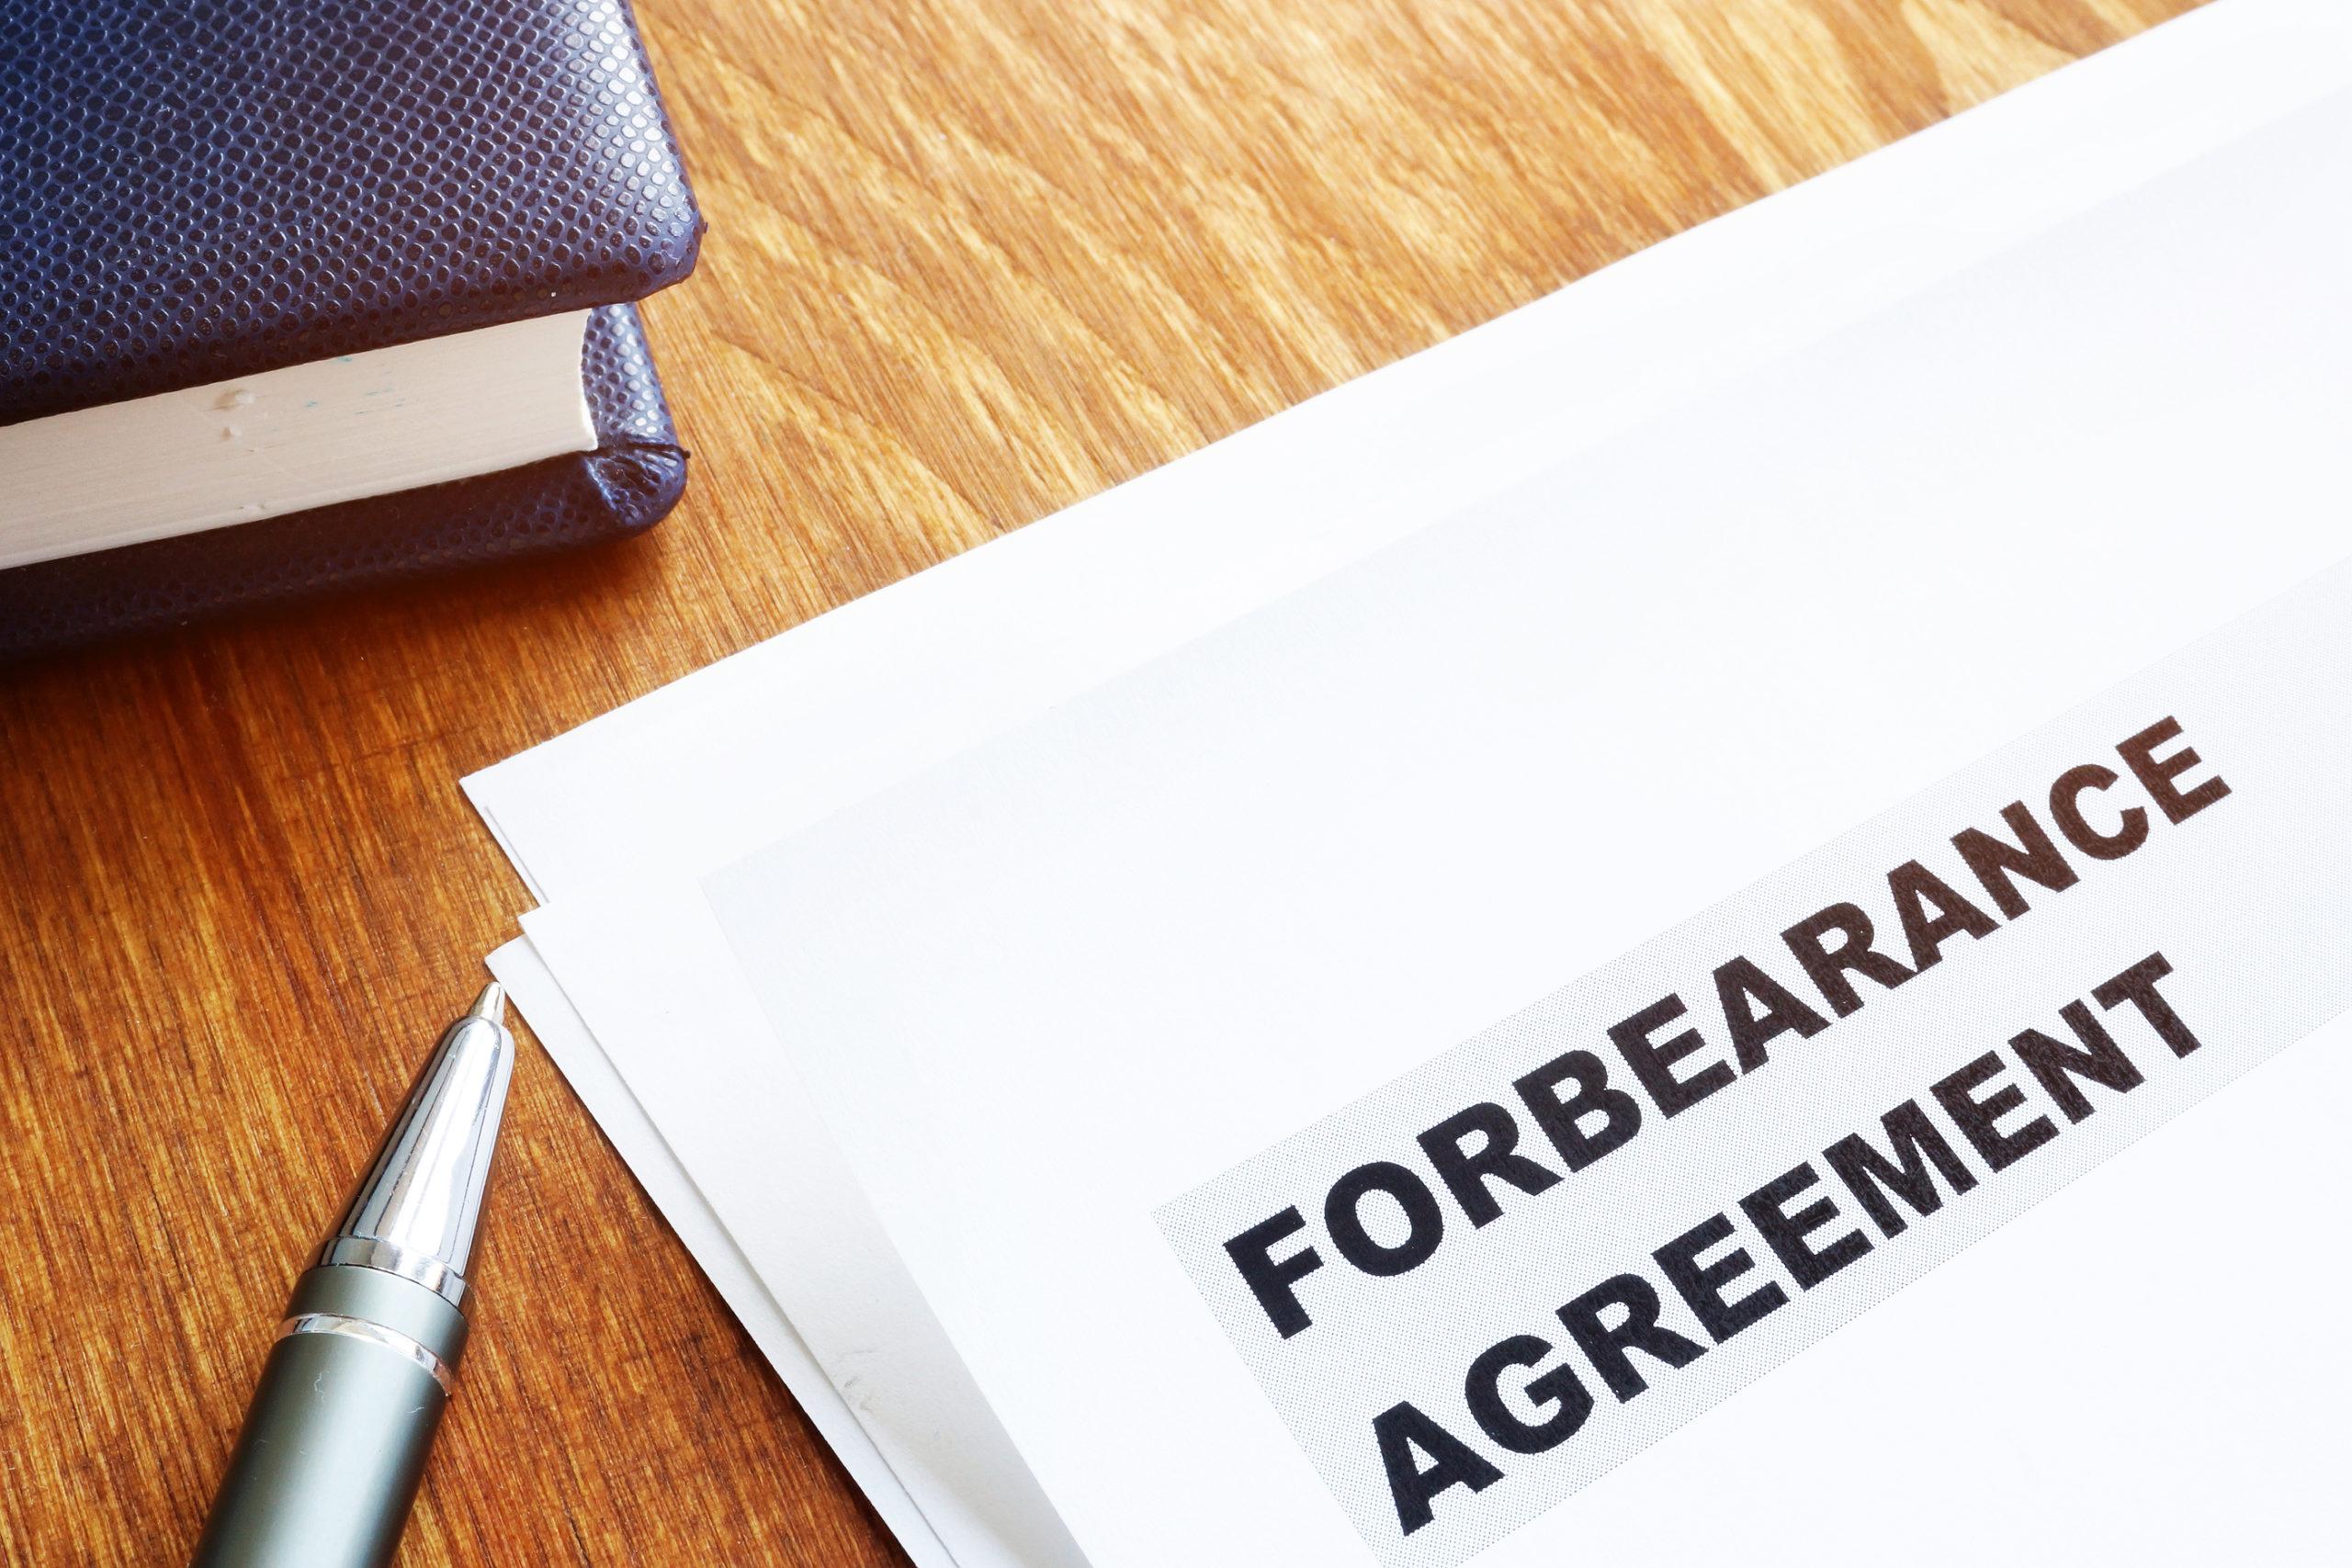 Forbearance-agreement